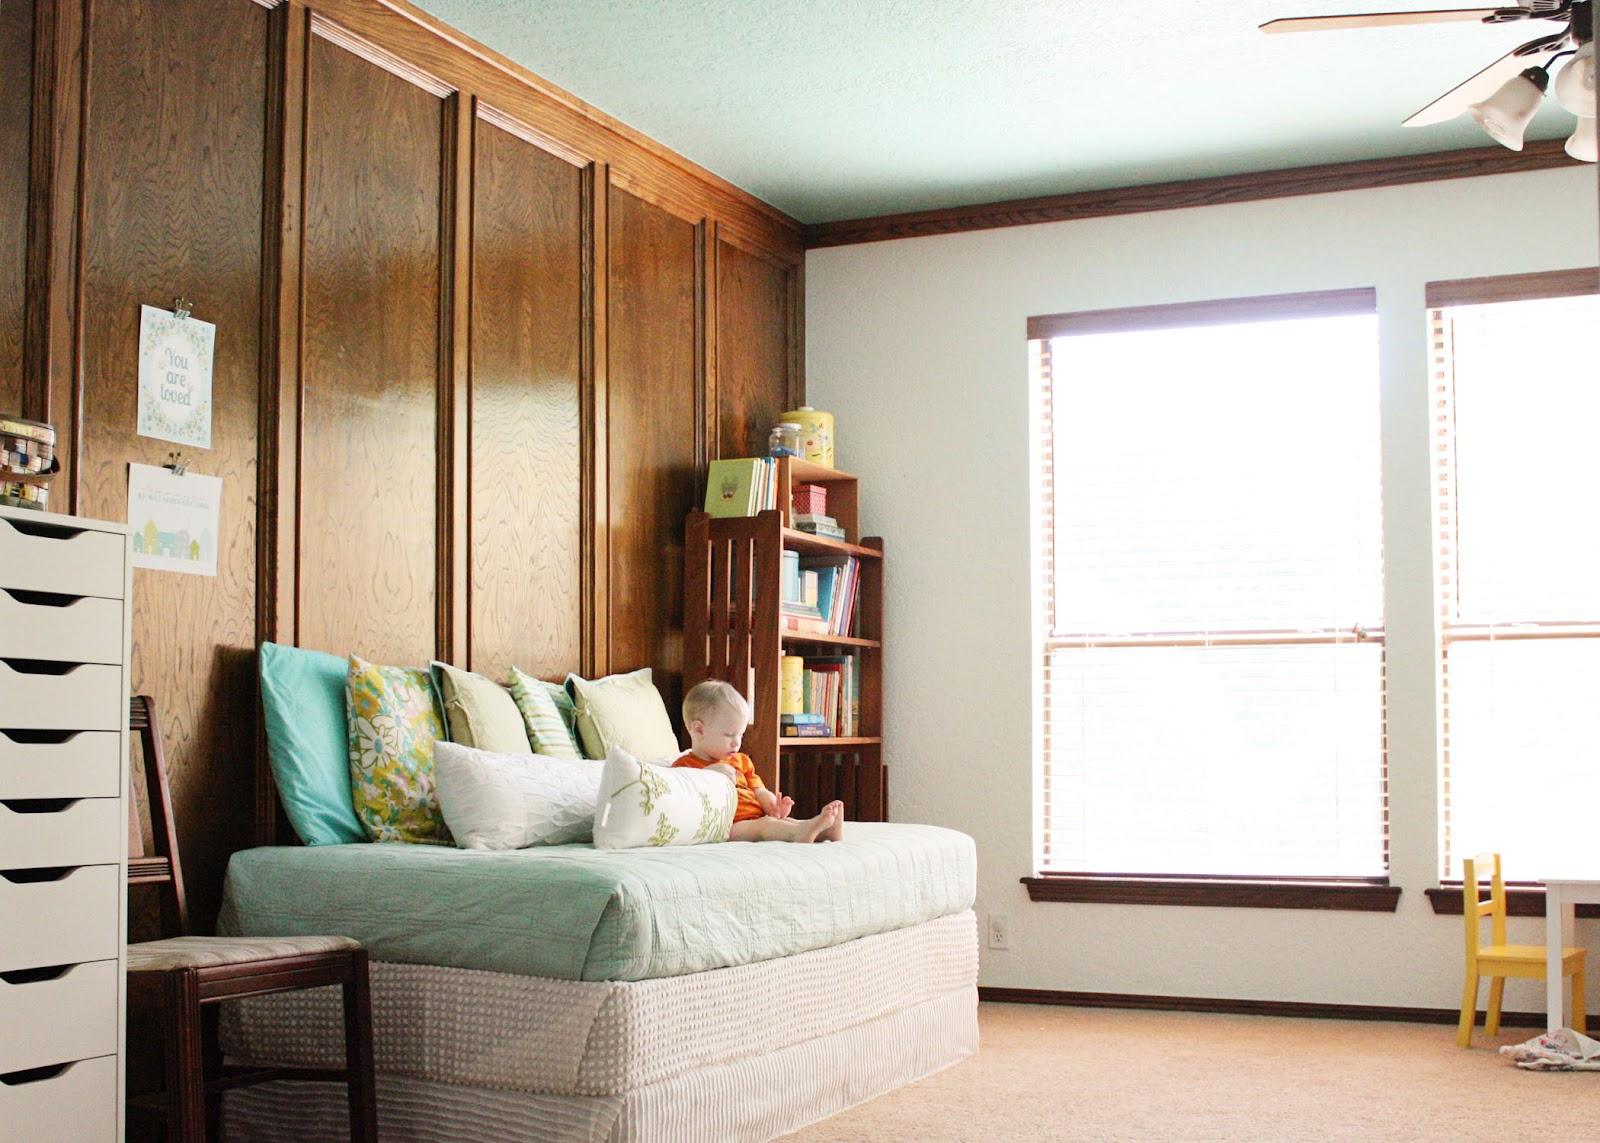 amy j delightful blog HOME SWEET HOME TOUR The Playroom : playroom13 from amyjdelightful.blogspot.com.au size 1600 x 1143 jpeg 311kB